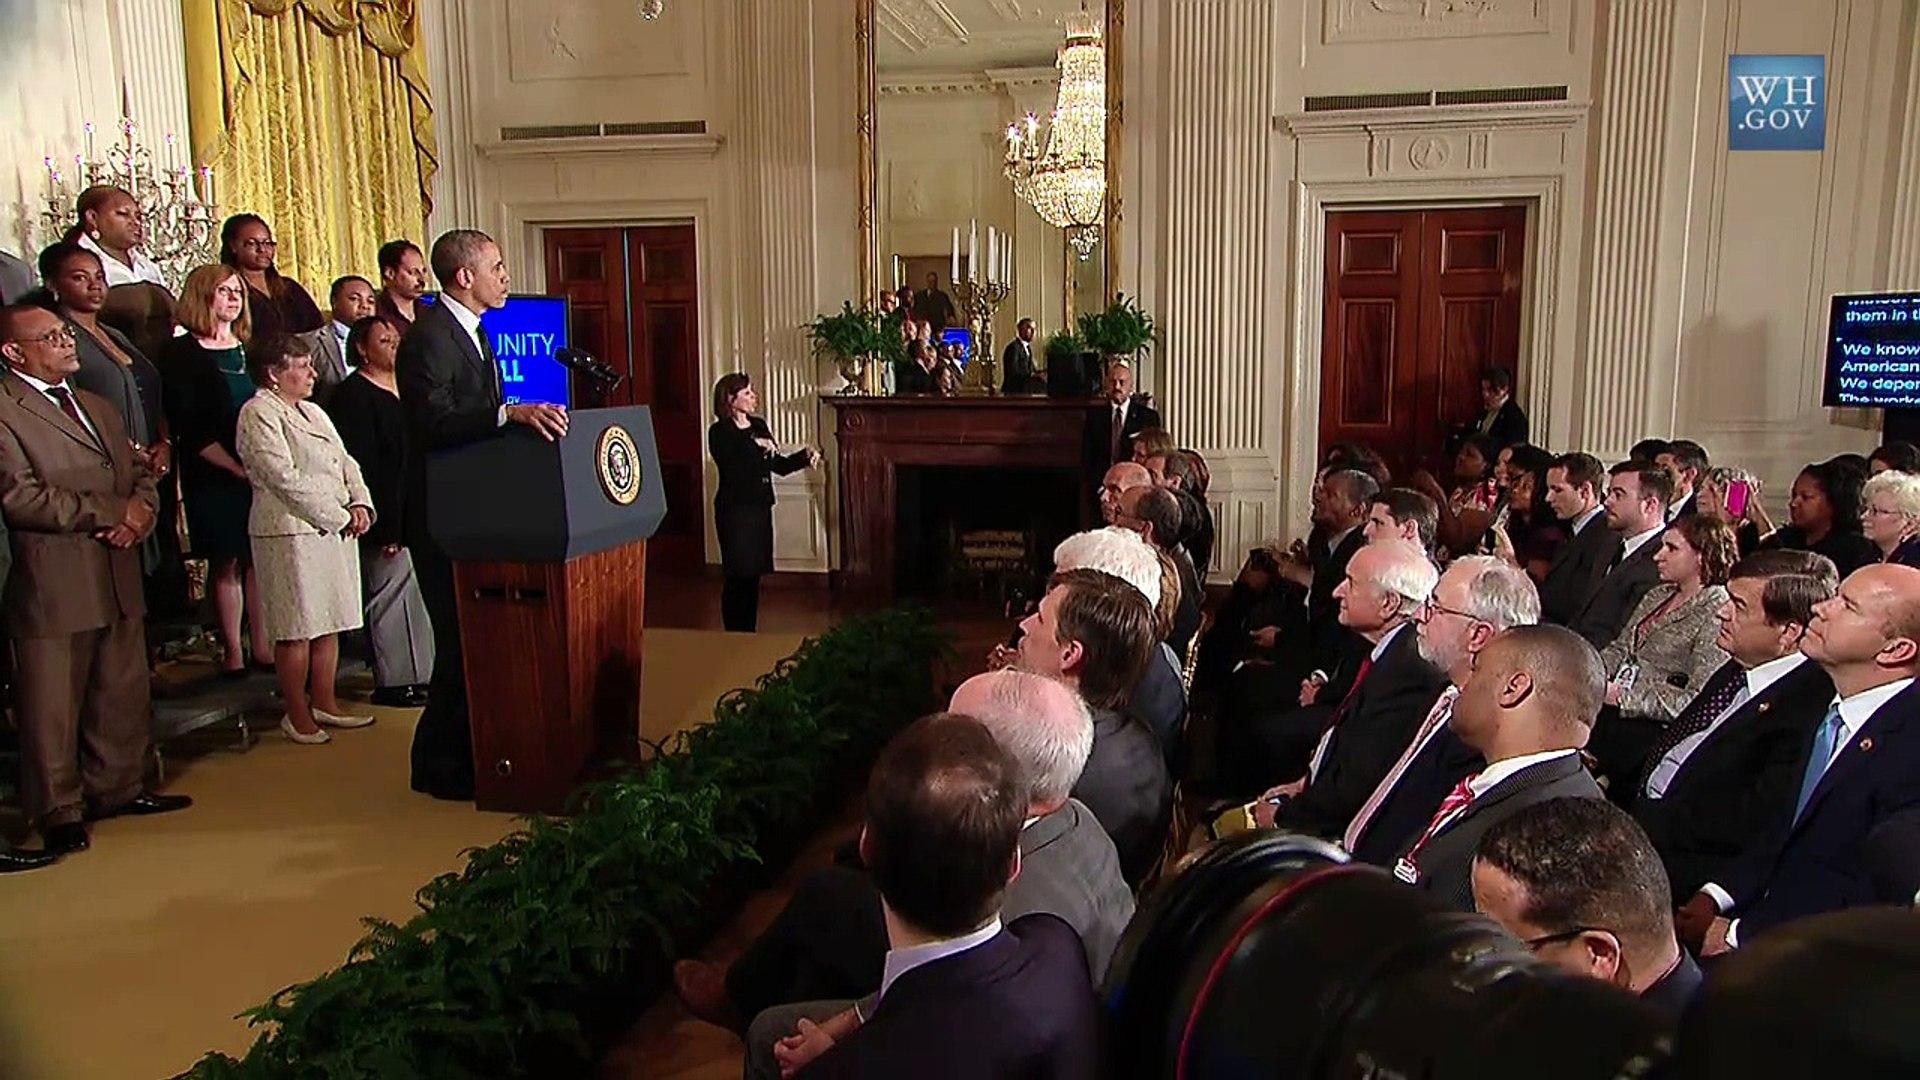 President Obama Speaks on Raising the Minimum Wage